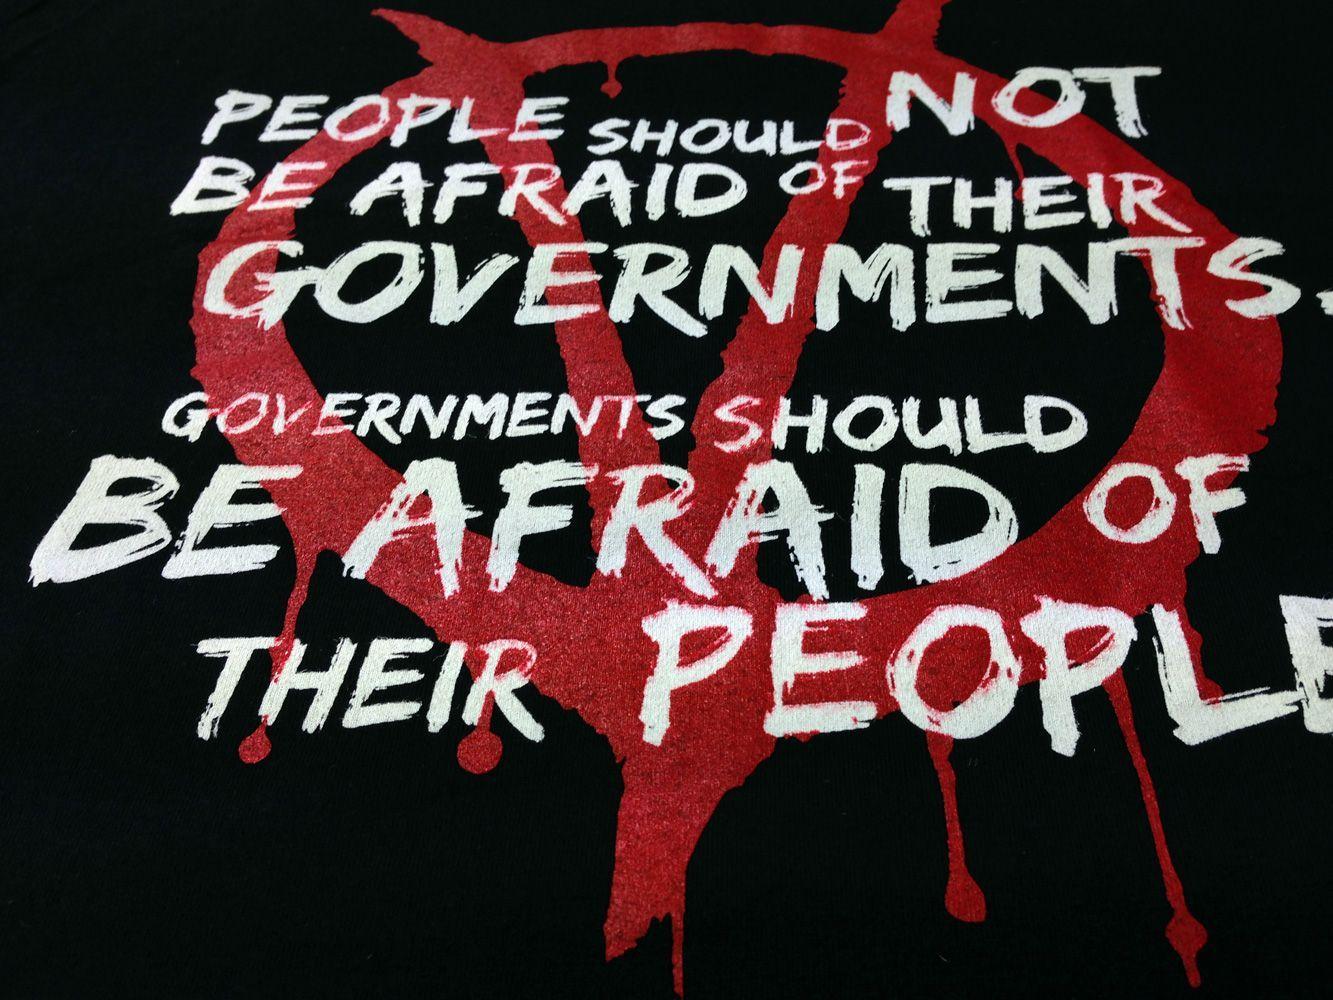 V For Vendetta Quotes Government Quotesgram Vendetta Quotes V For Vendetta Quotes V For Vendetta